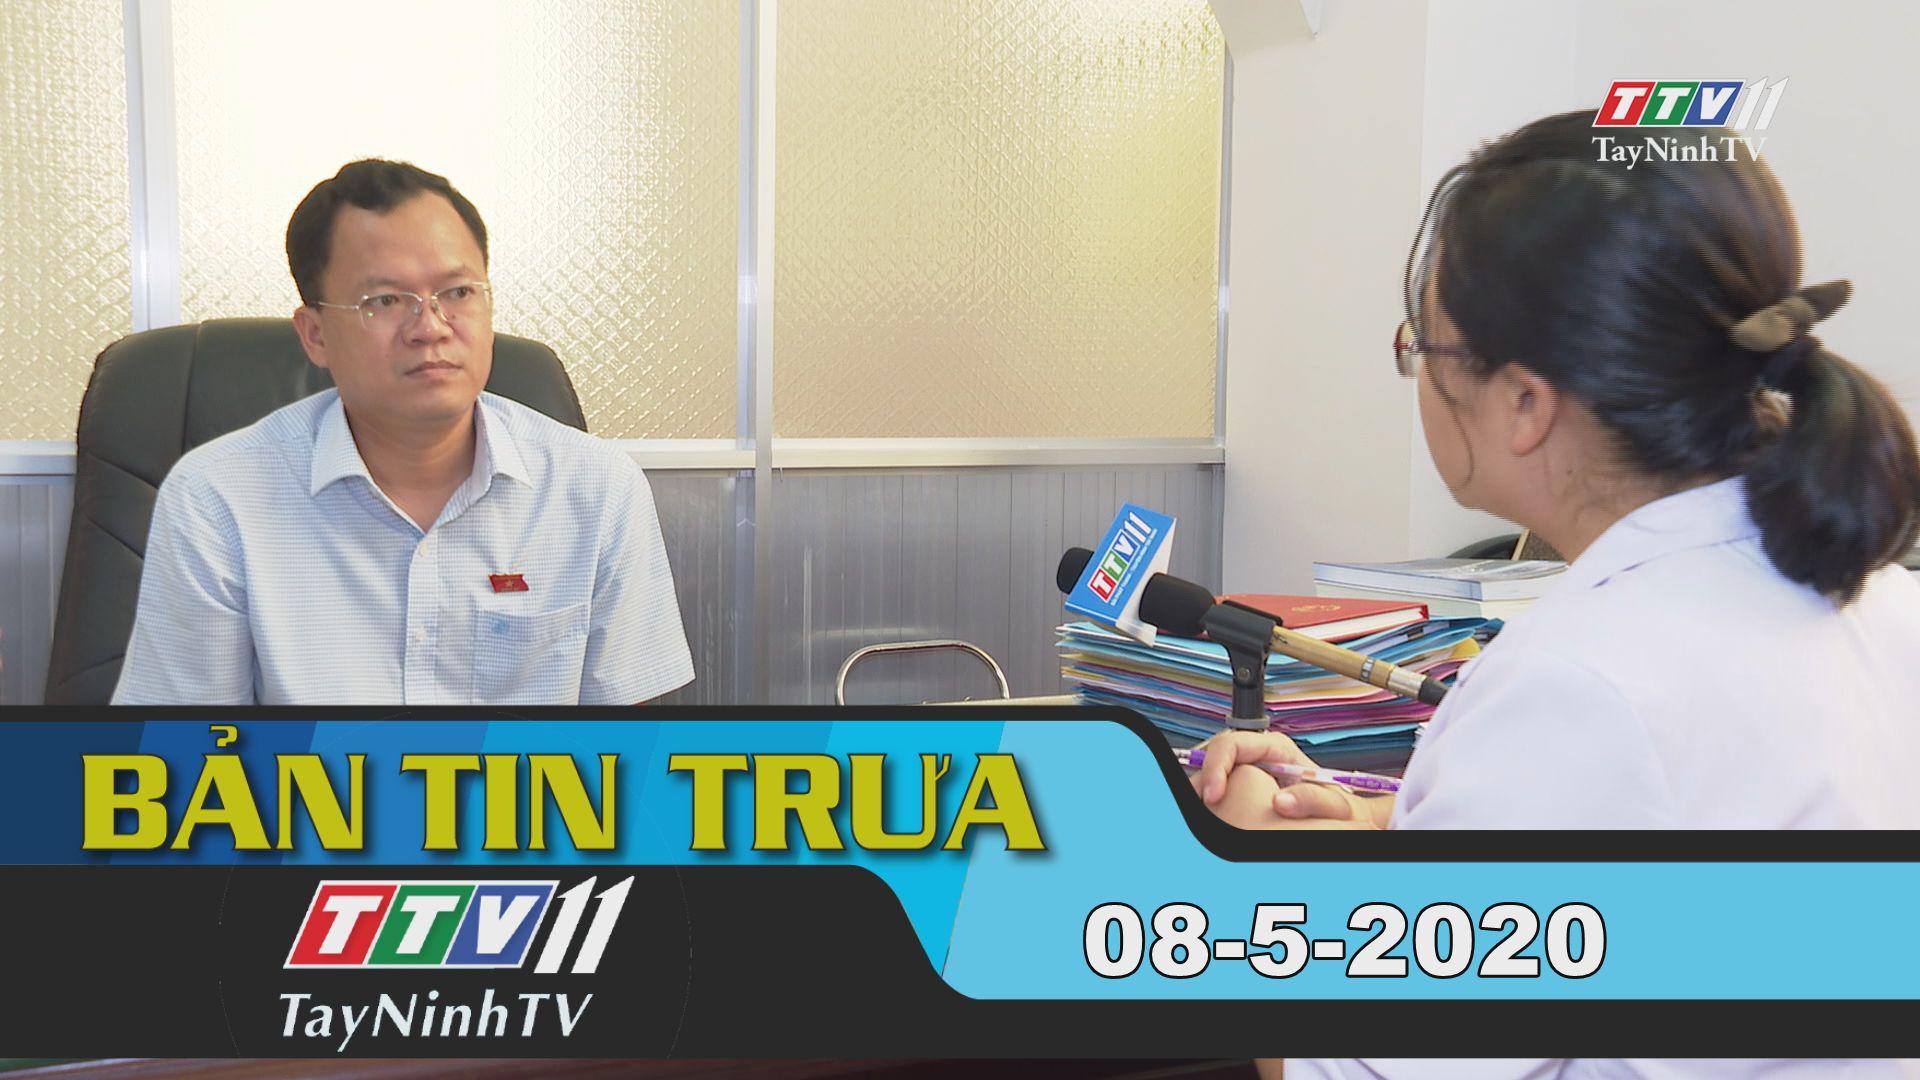 Bản tin trưa 08-5-2020 | Tin tức hôm nay | TayNinhTV